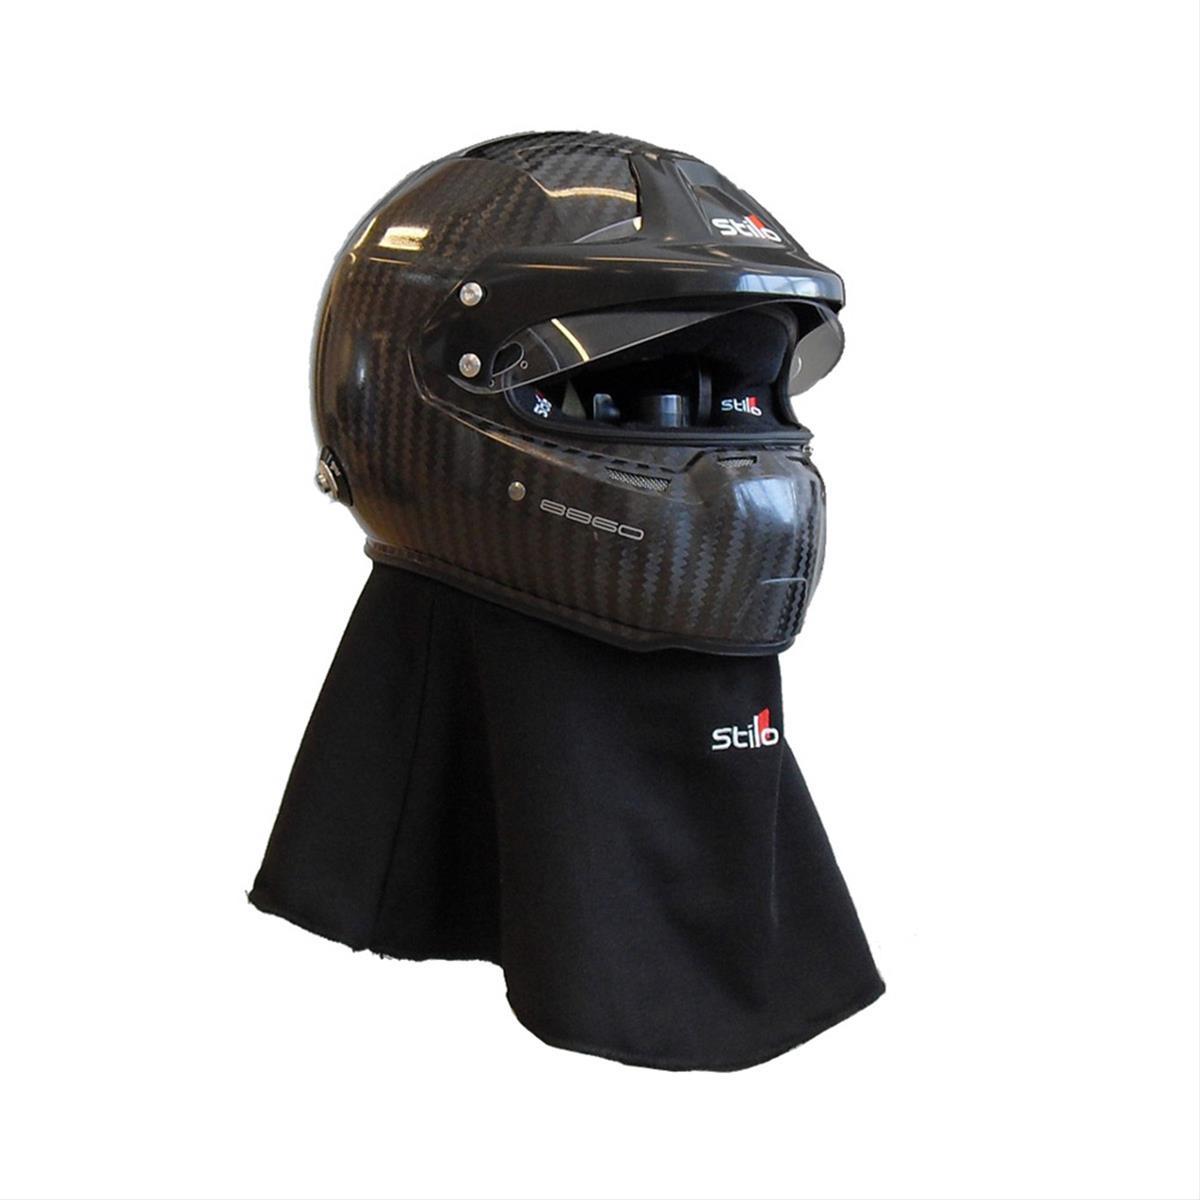 Summit Racing Helmets >> Stilo S YA0830 - Free Shipping on Orders Over $99 at Summit Racing